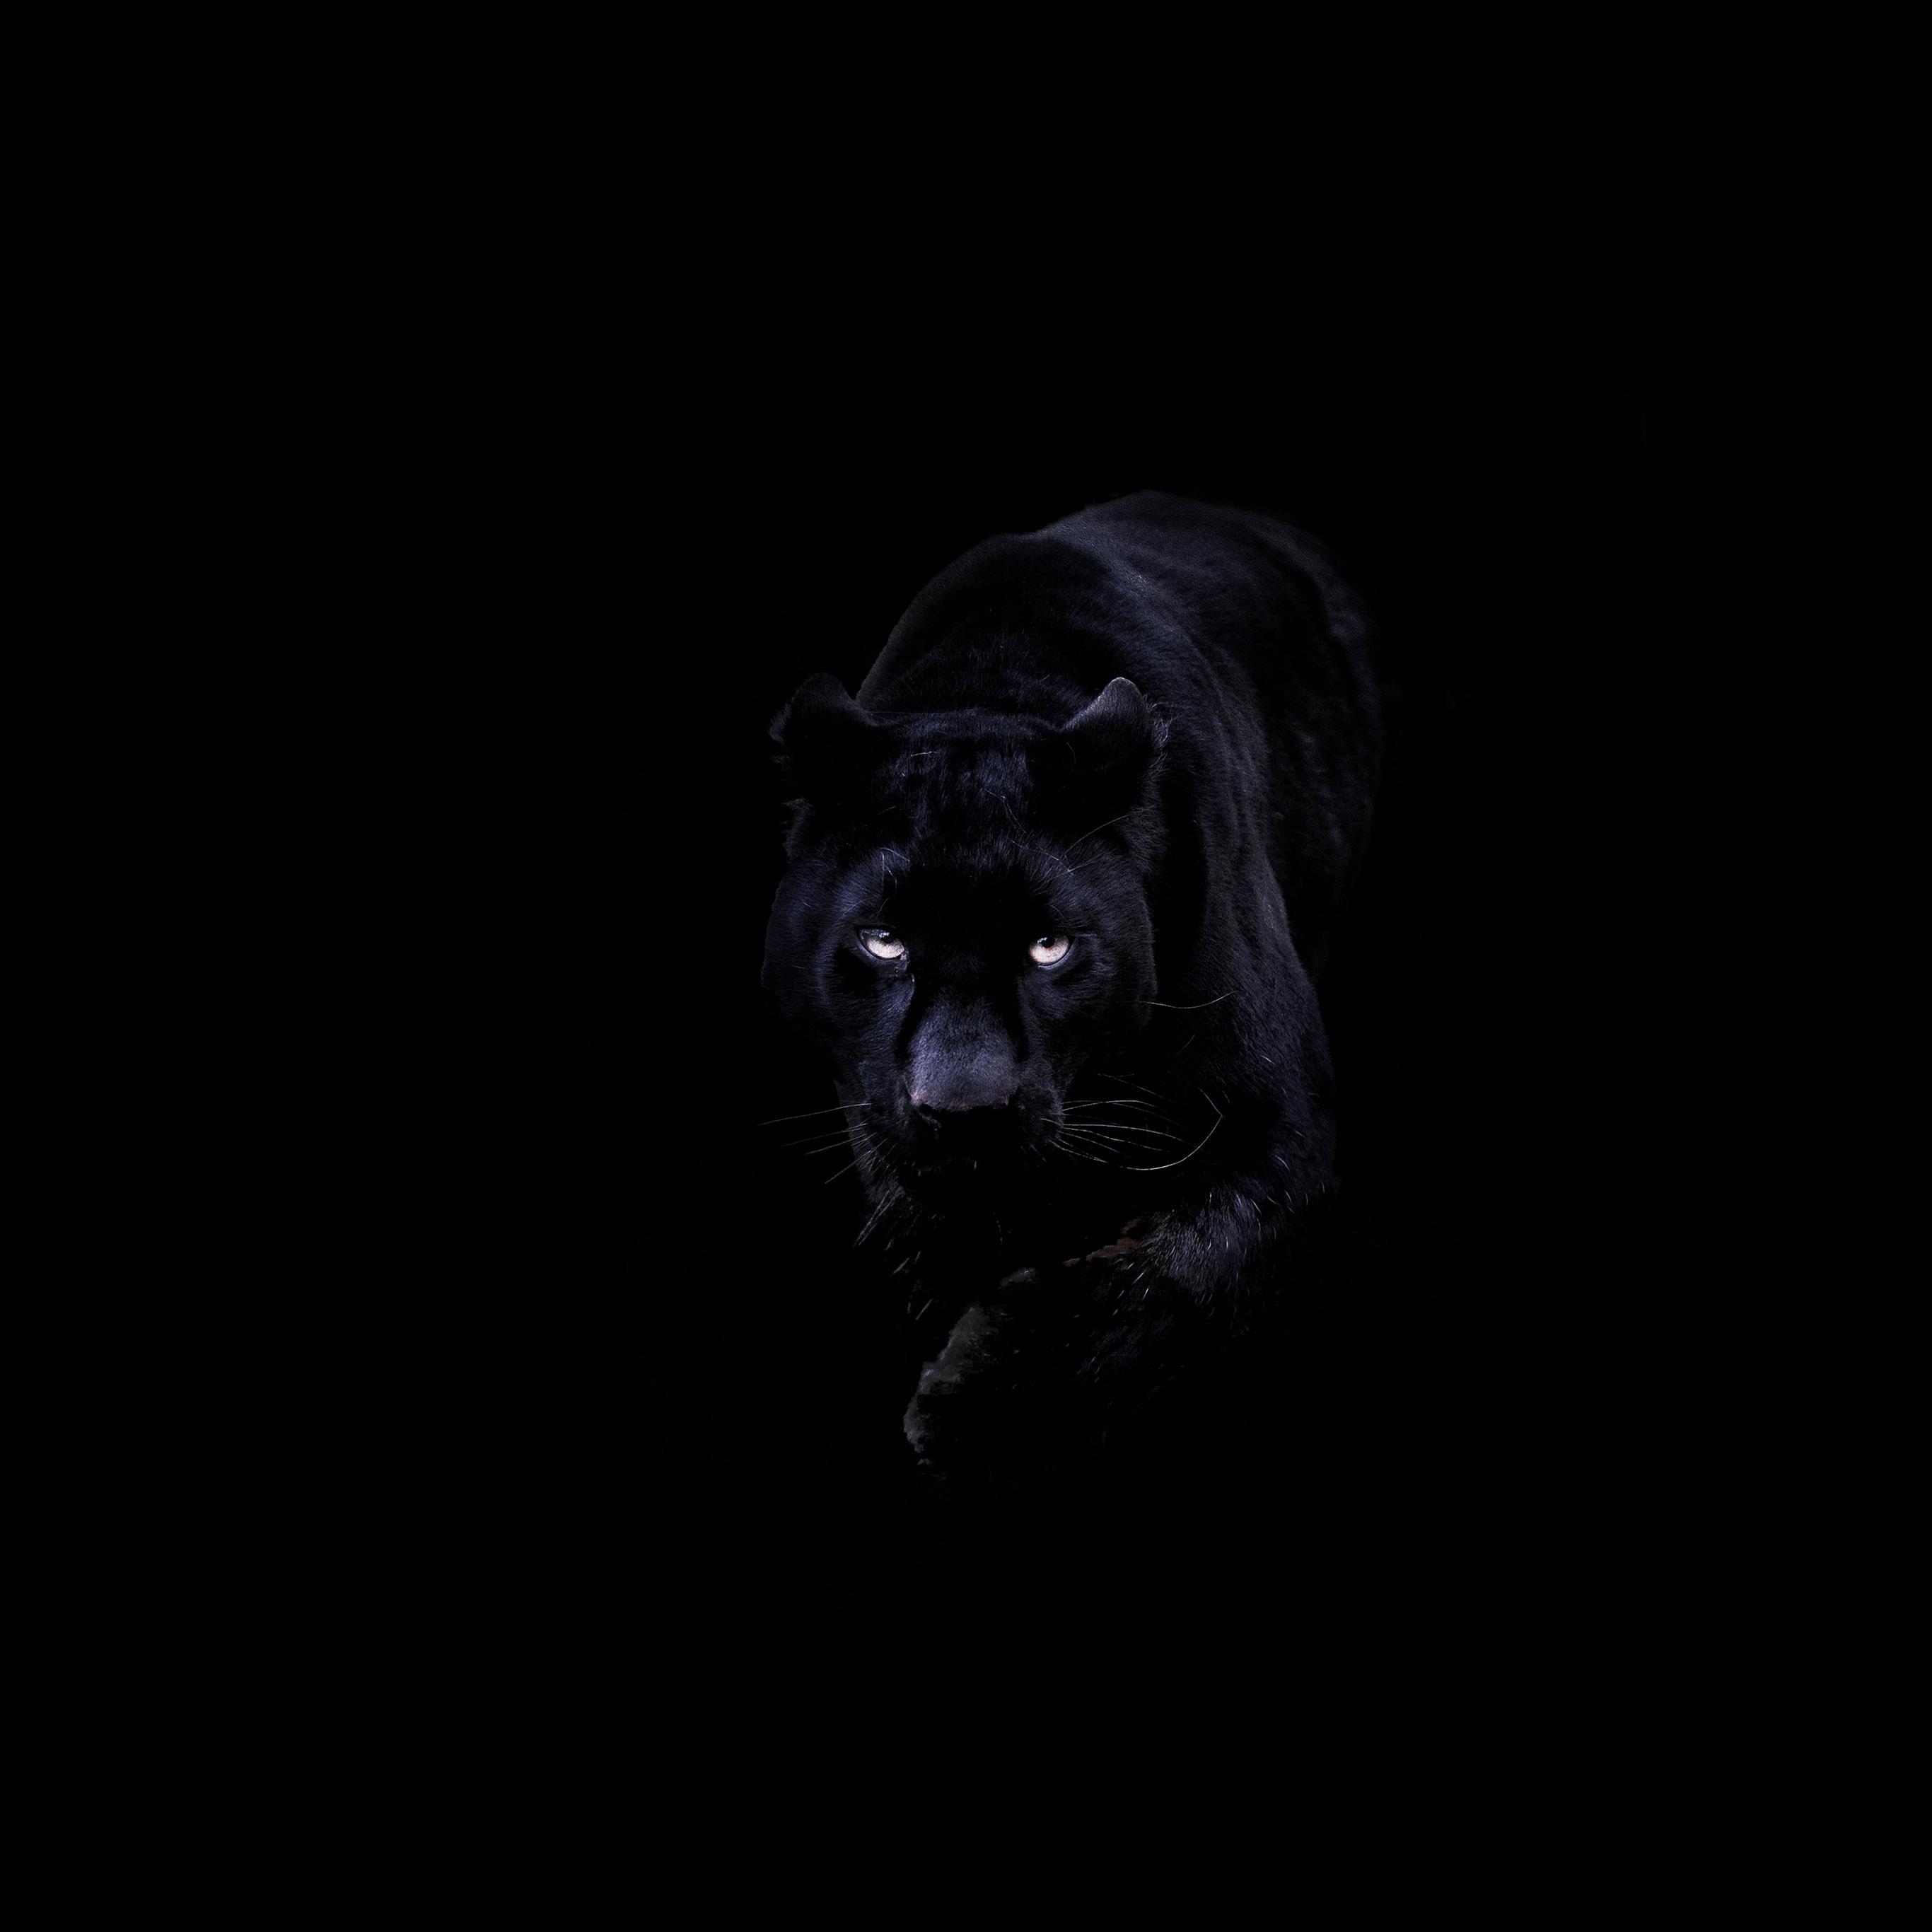 Bd93 Animal Dark Black Pahter Art Illustration Wallpaper